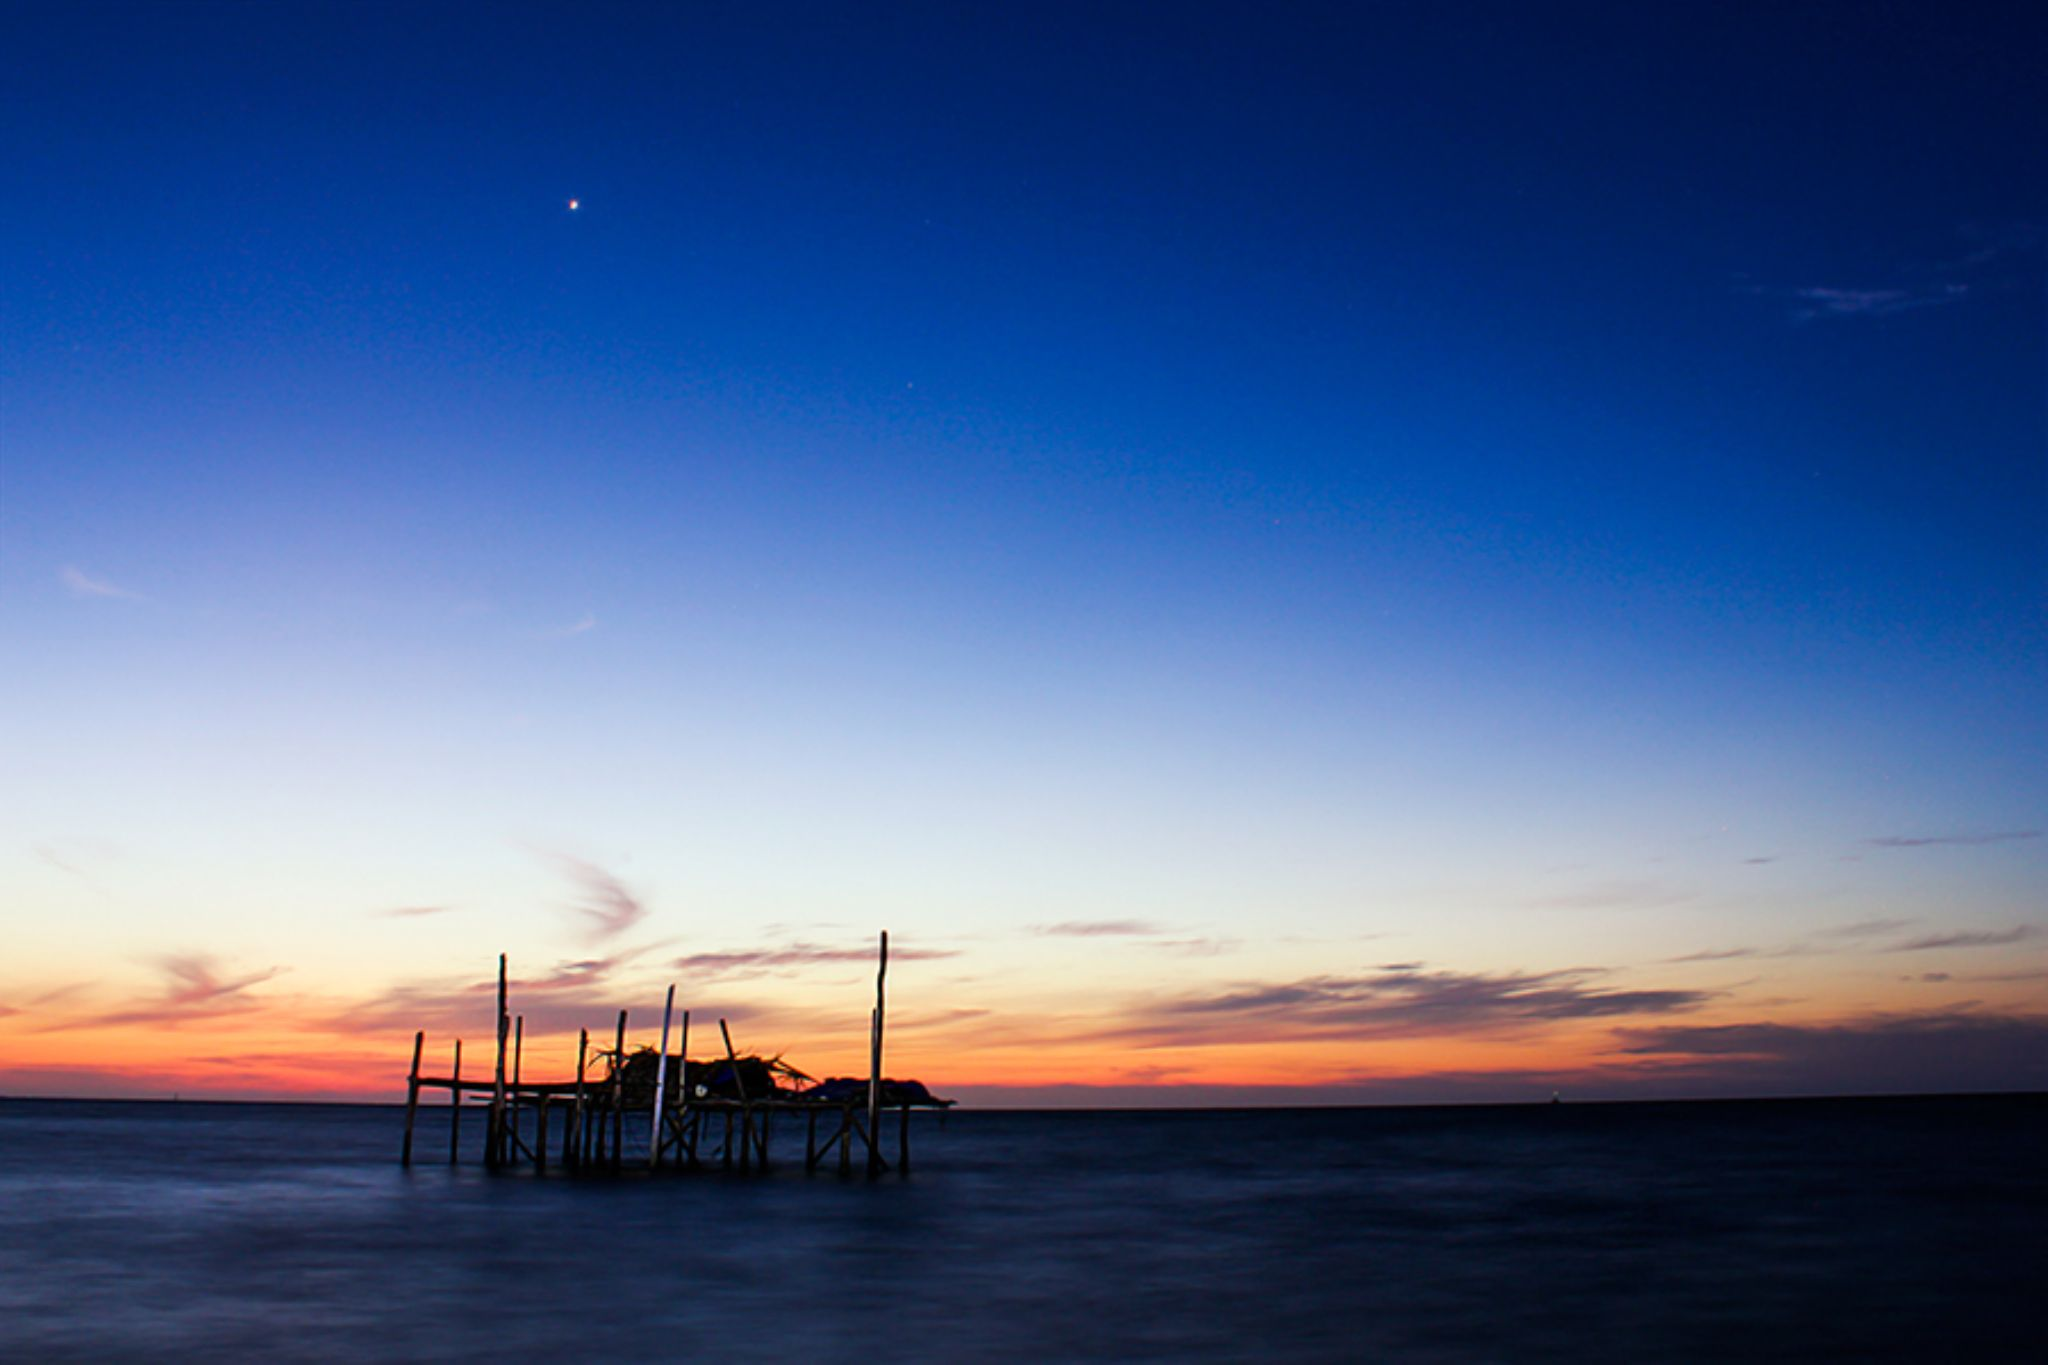 sunrise by khusnizld